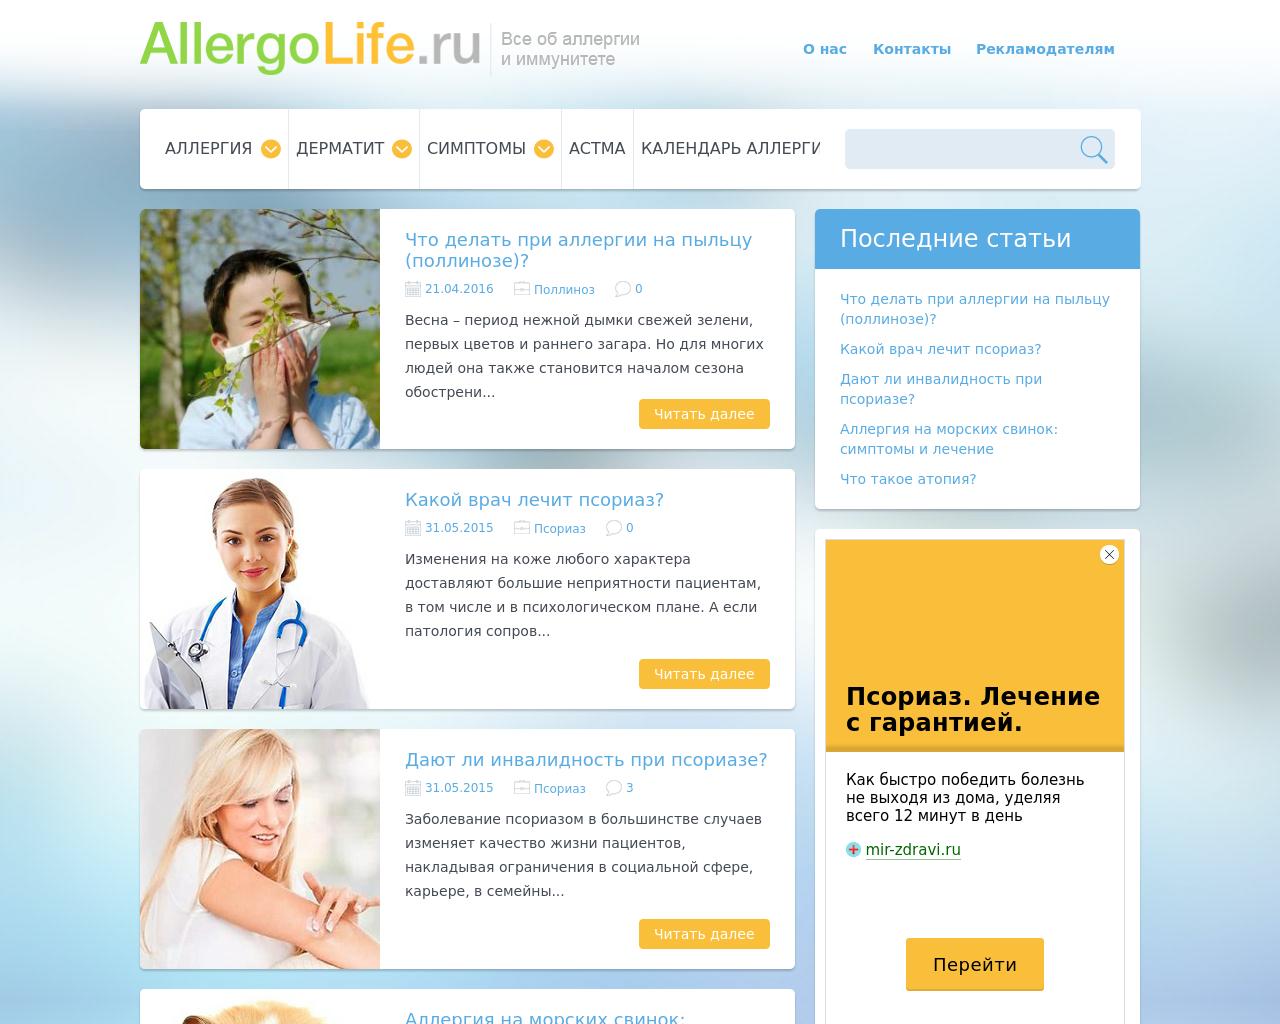 AllergoLife.ru-Advertising-Reviews-Pricing